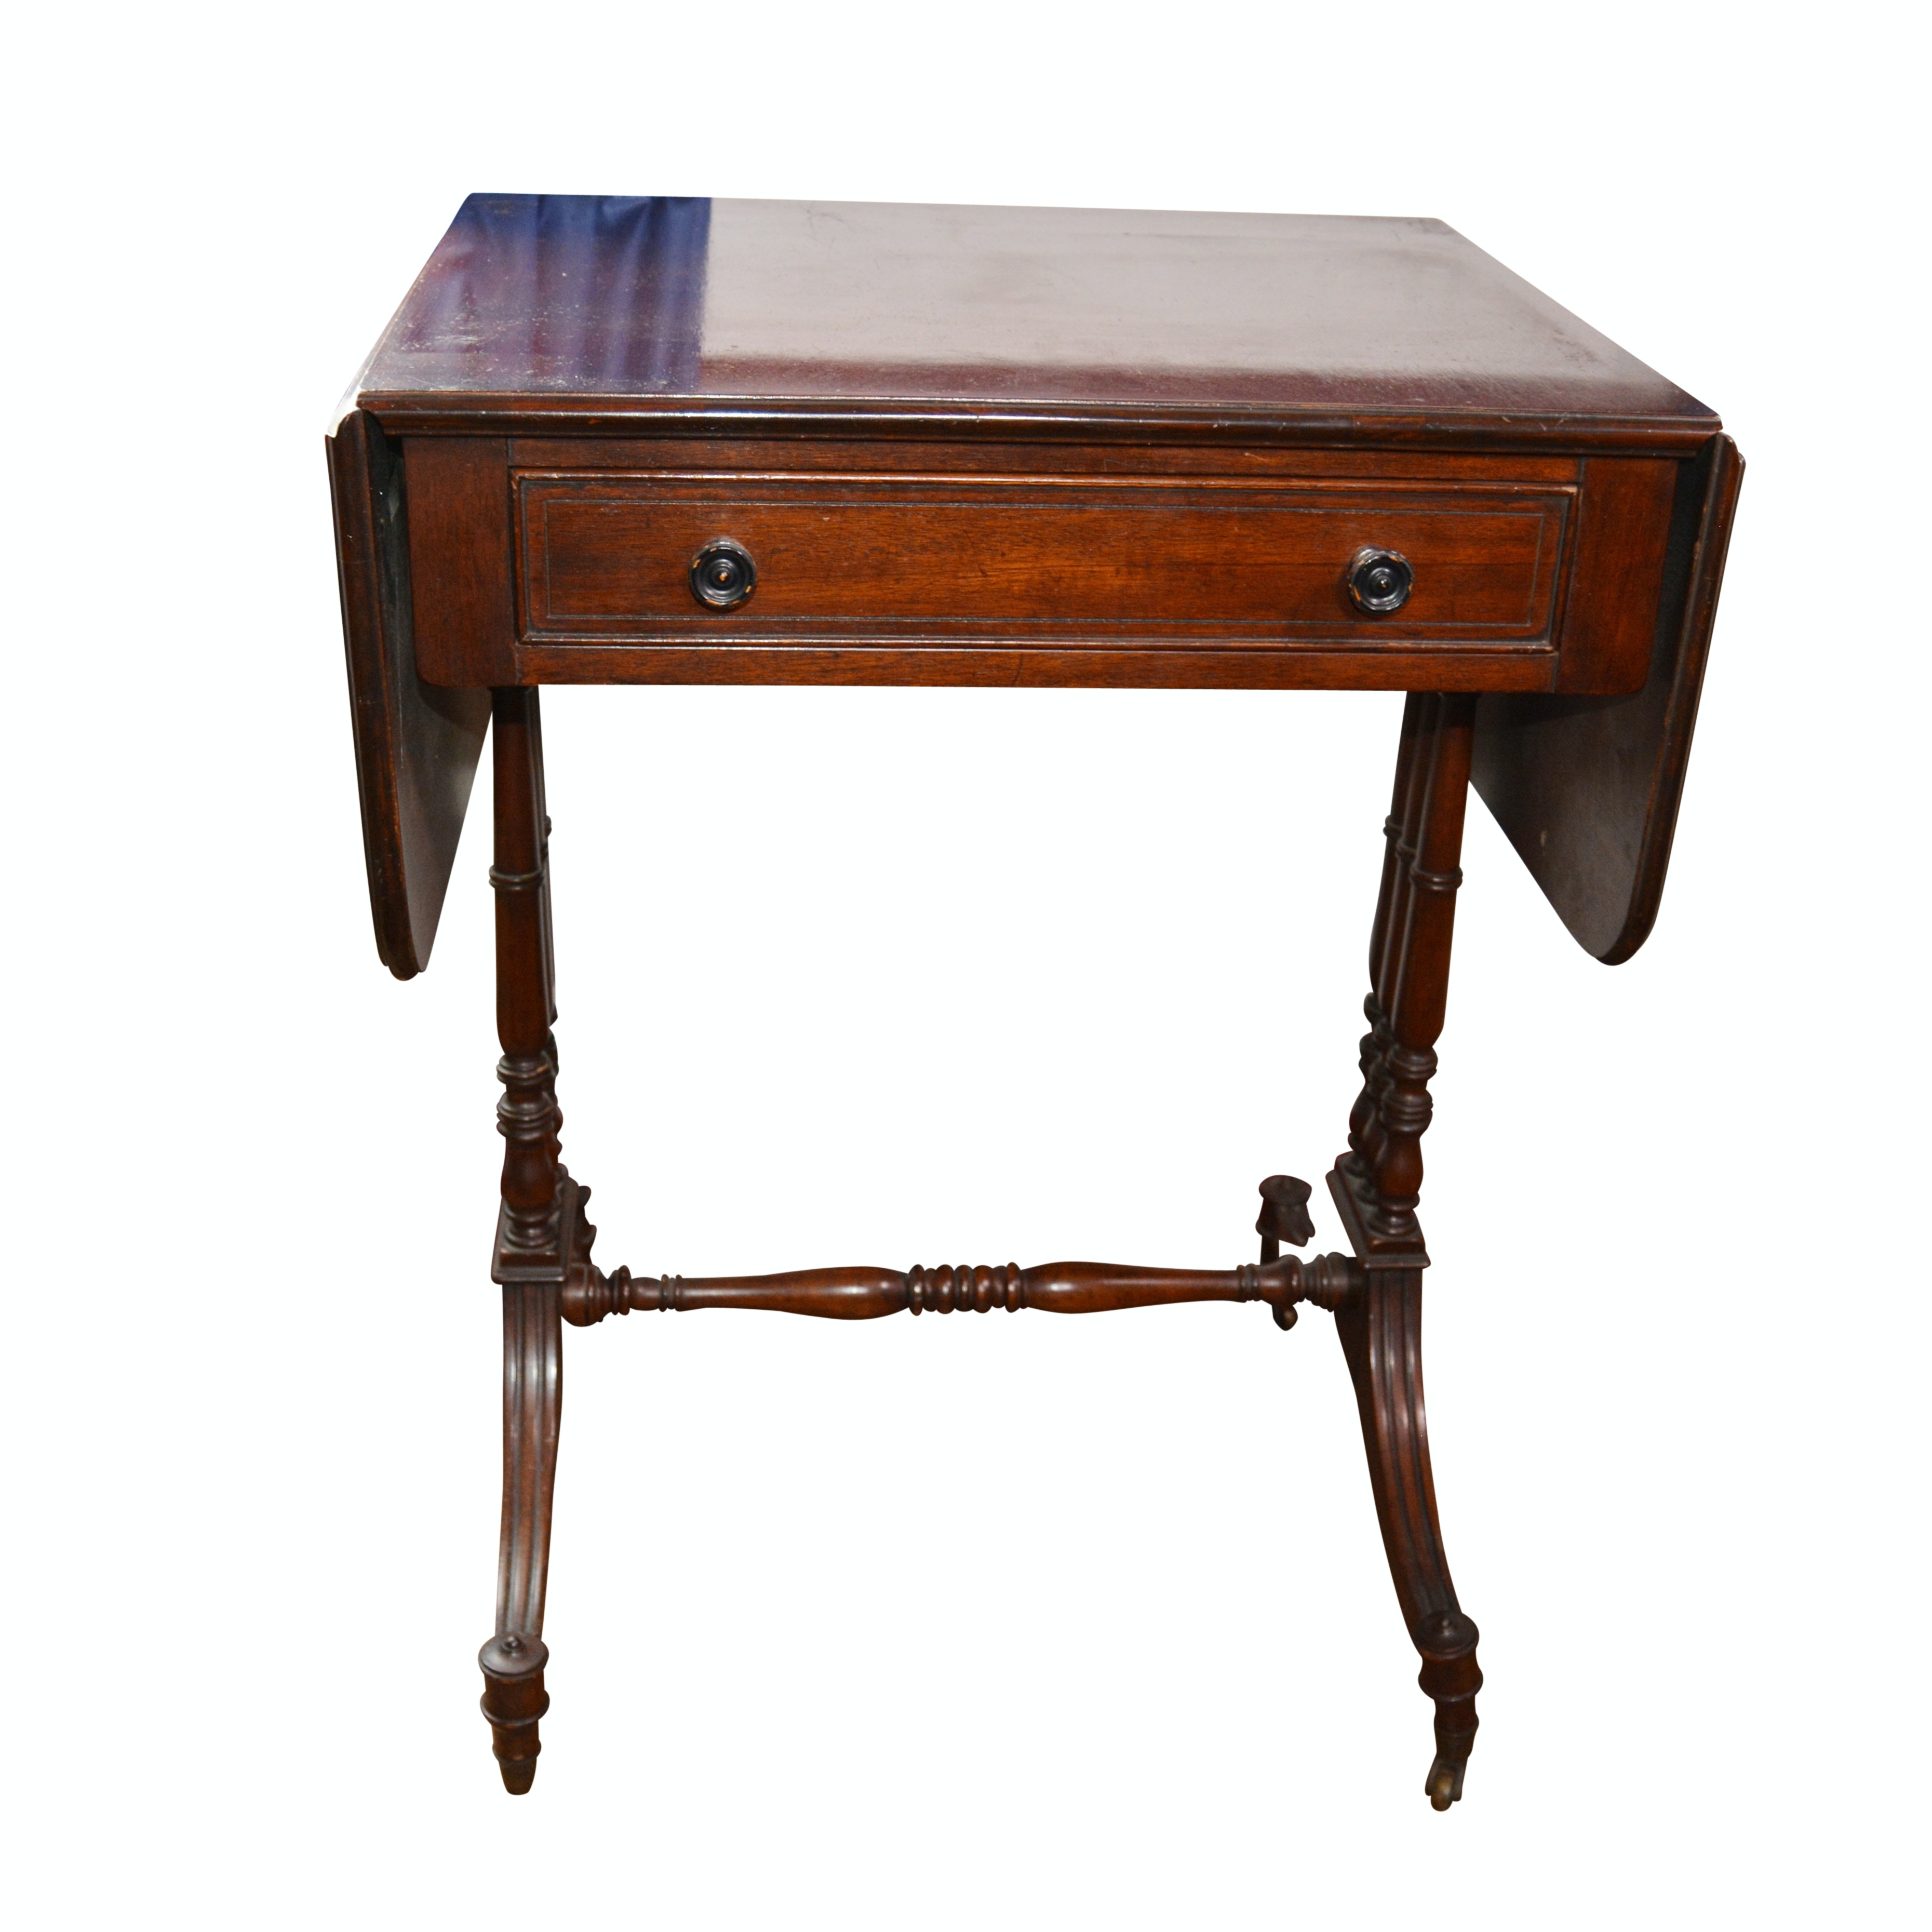 Regency Style Mahogany Drop-Leaf Side Table, 20th Century